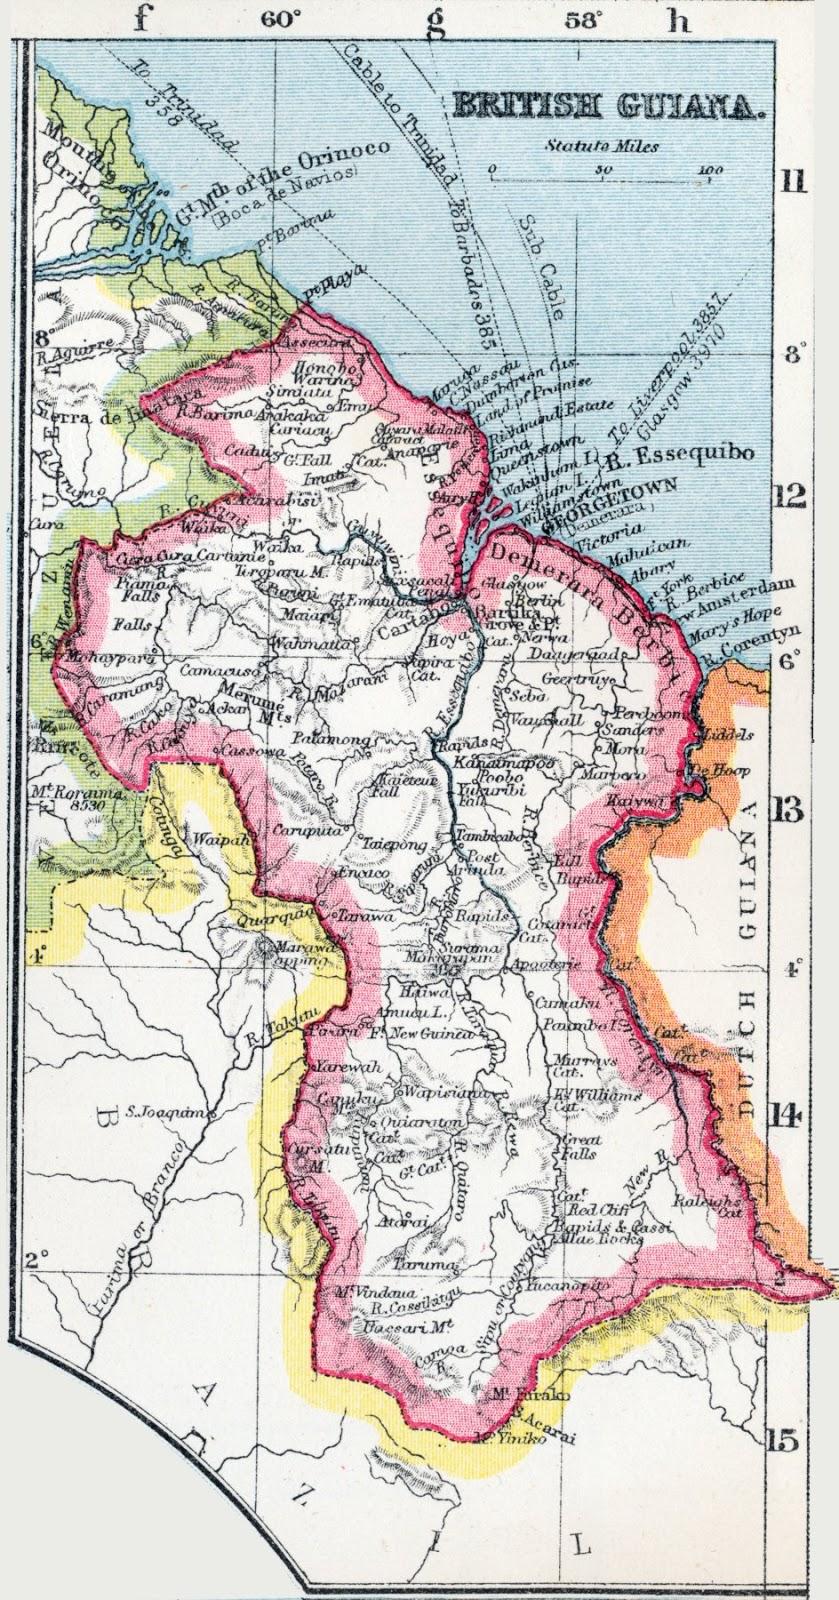 Guajana - harta gjeografike e Guajana